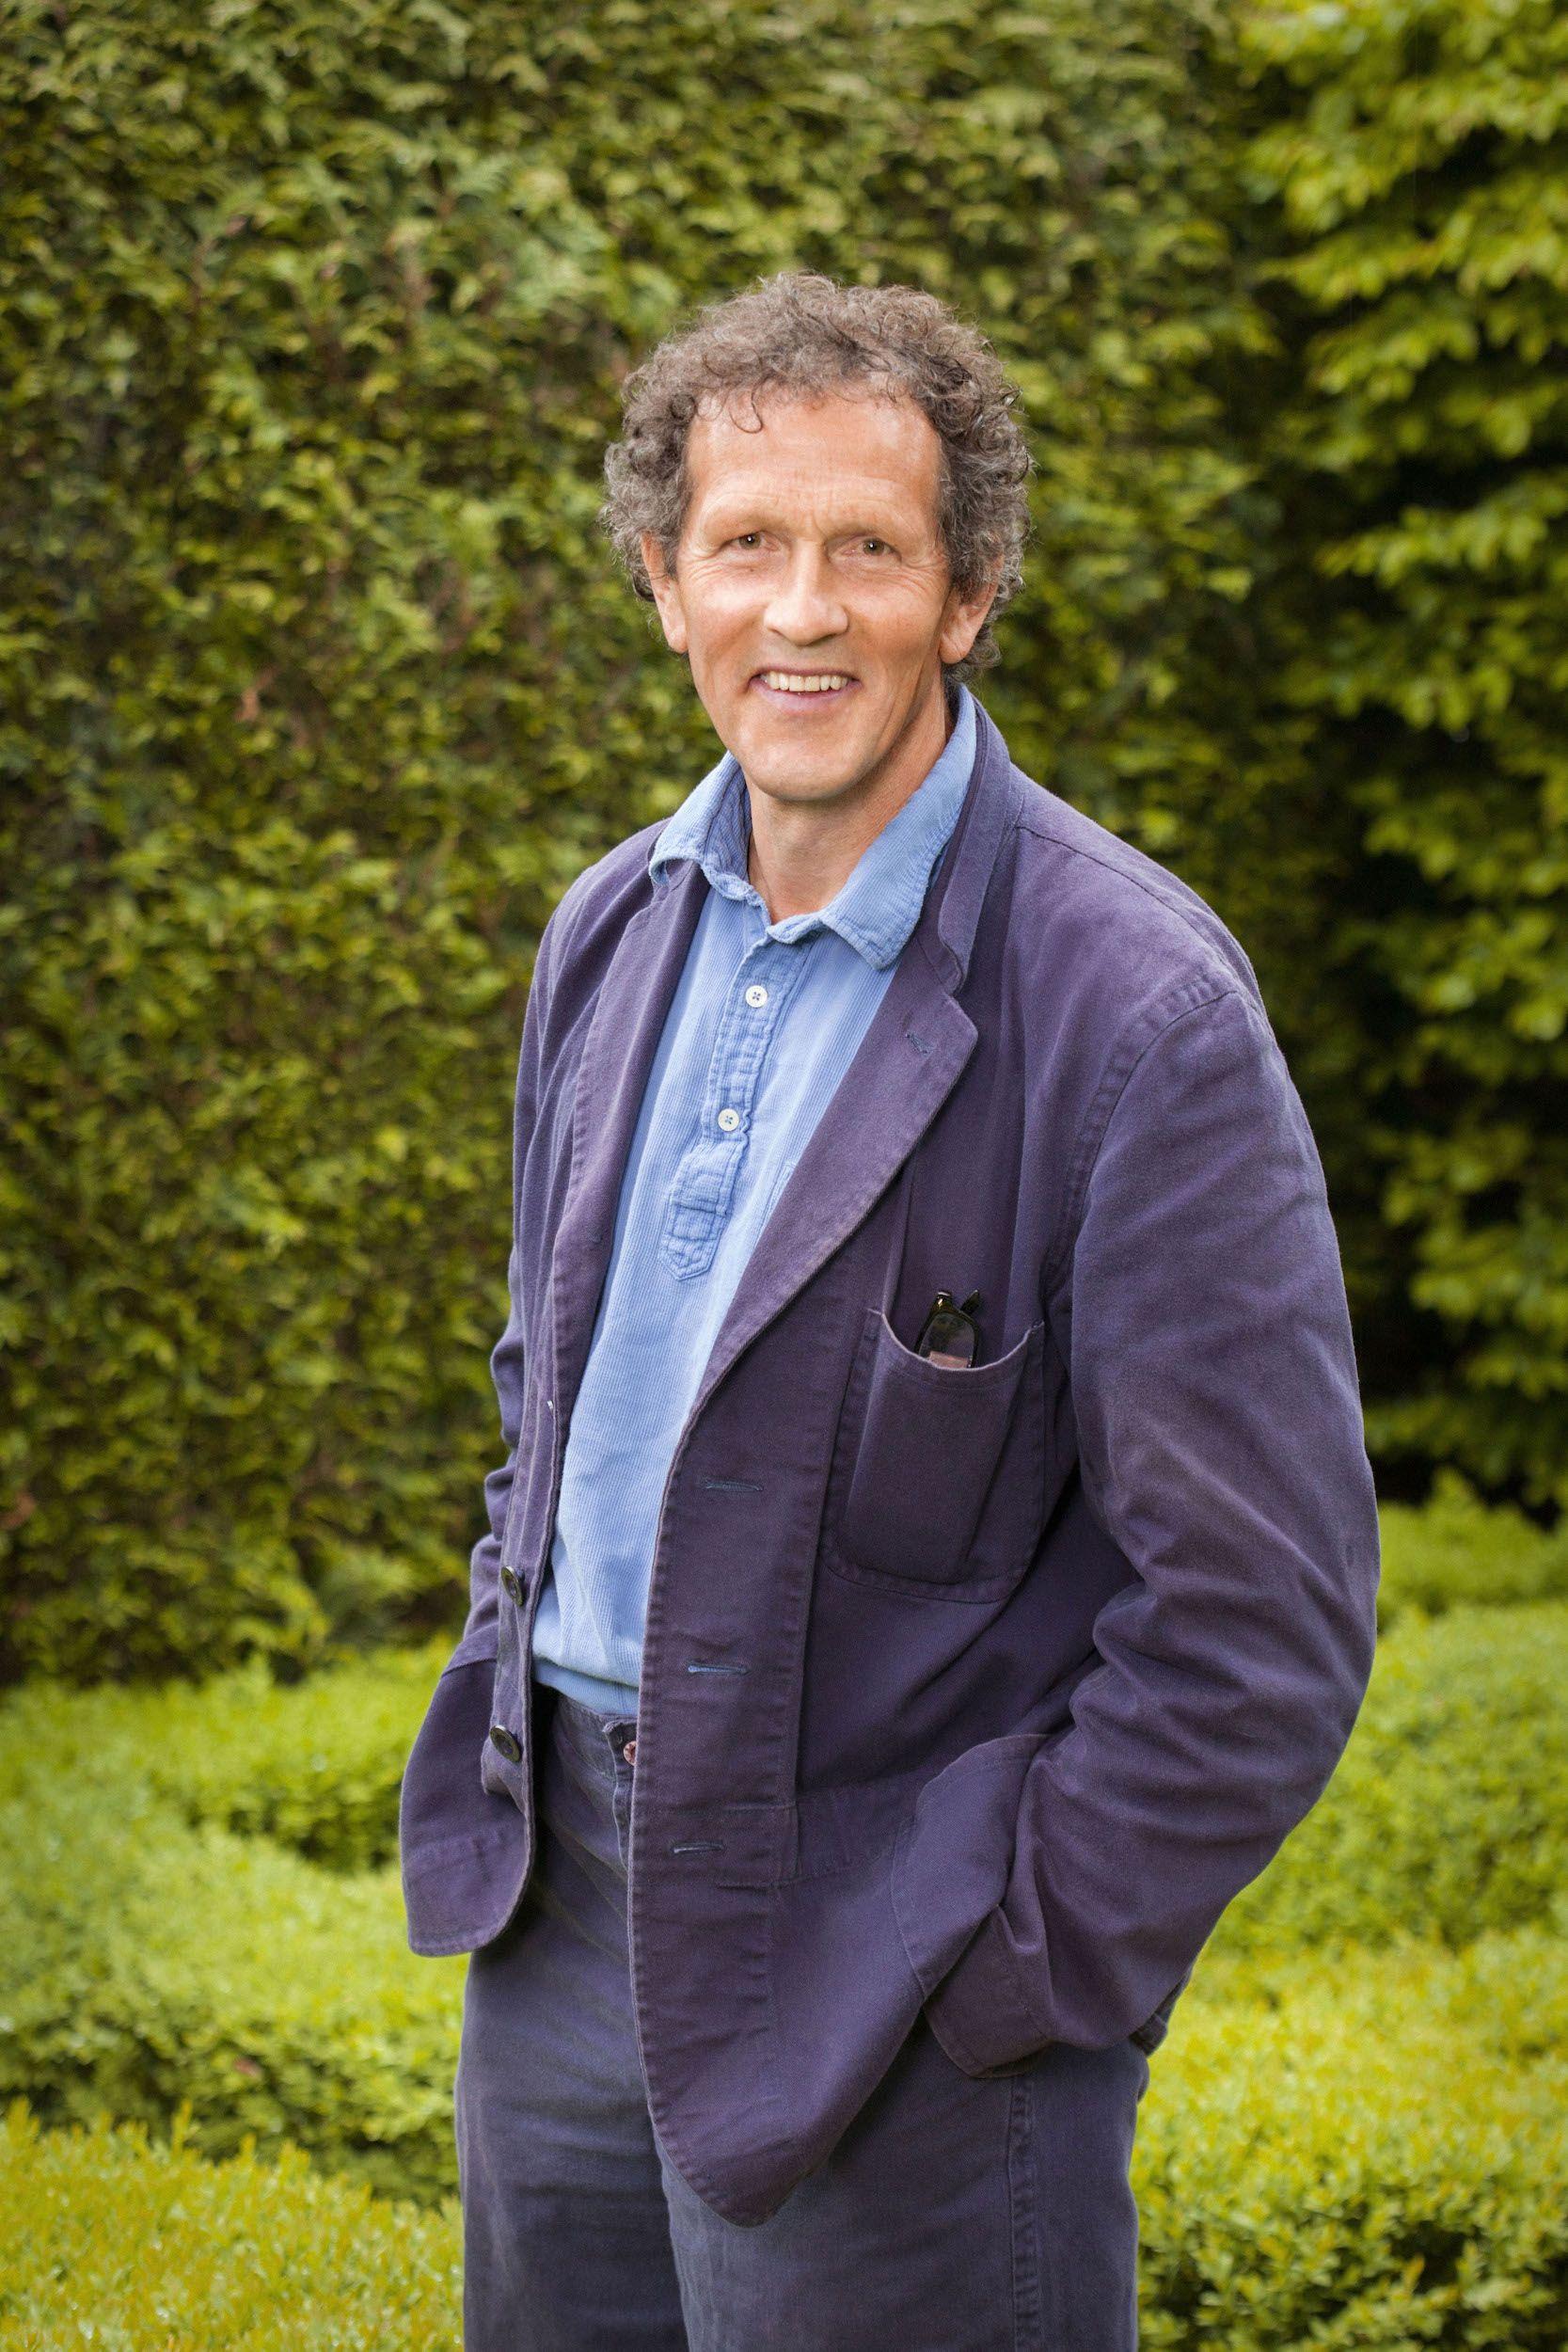 Monty Don praises the healing power of gardens during lockdown